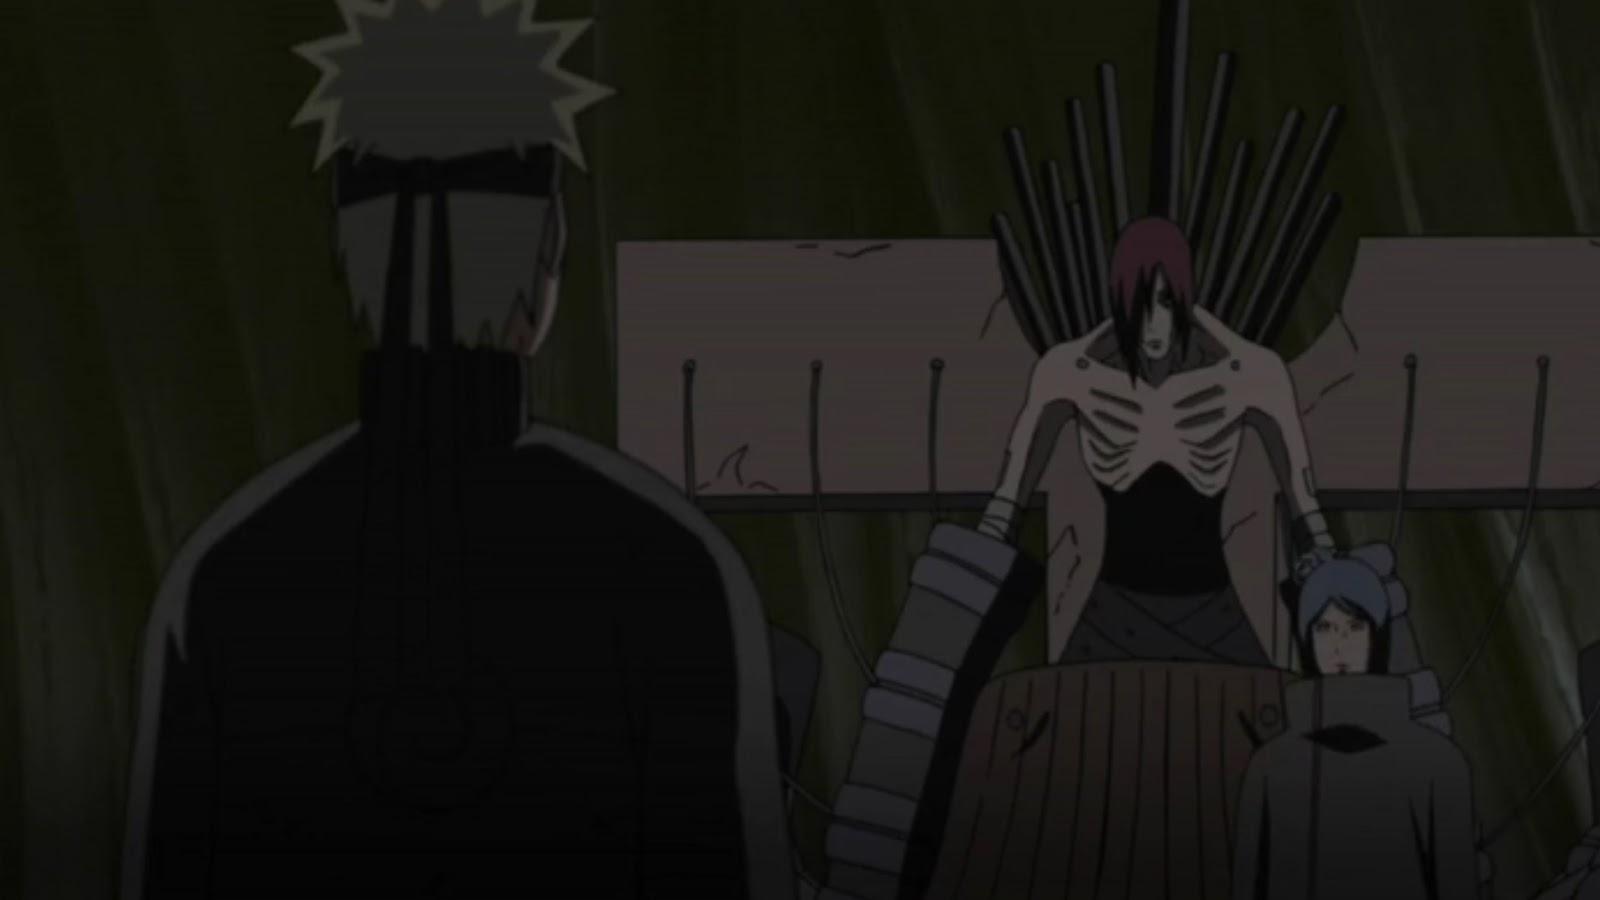 Naruto Shippuden: Episódio 172 – Encontro